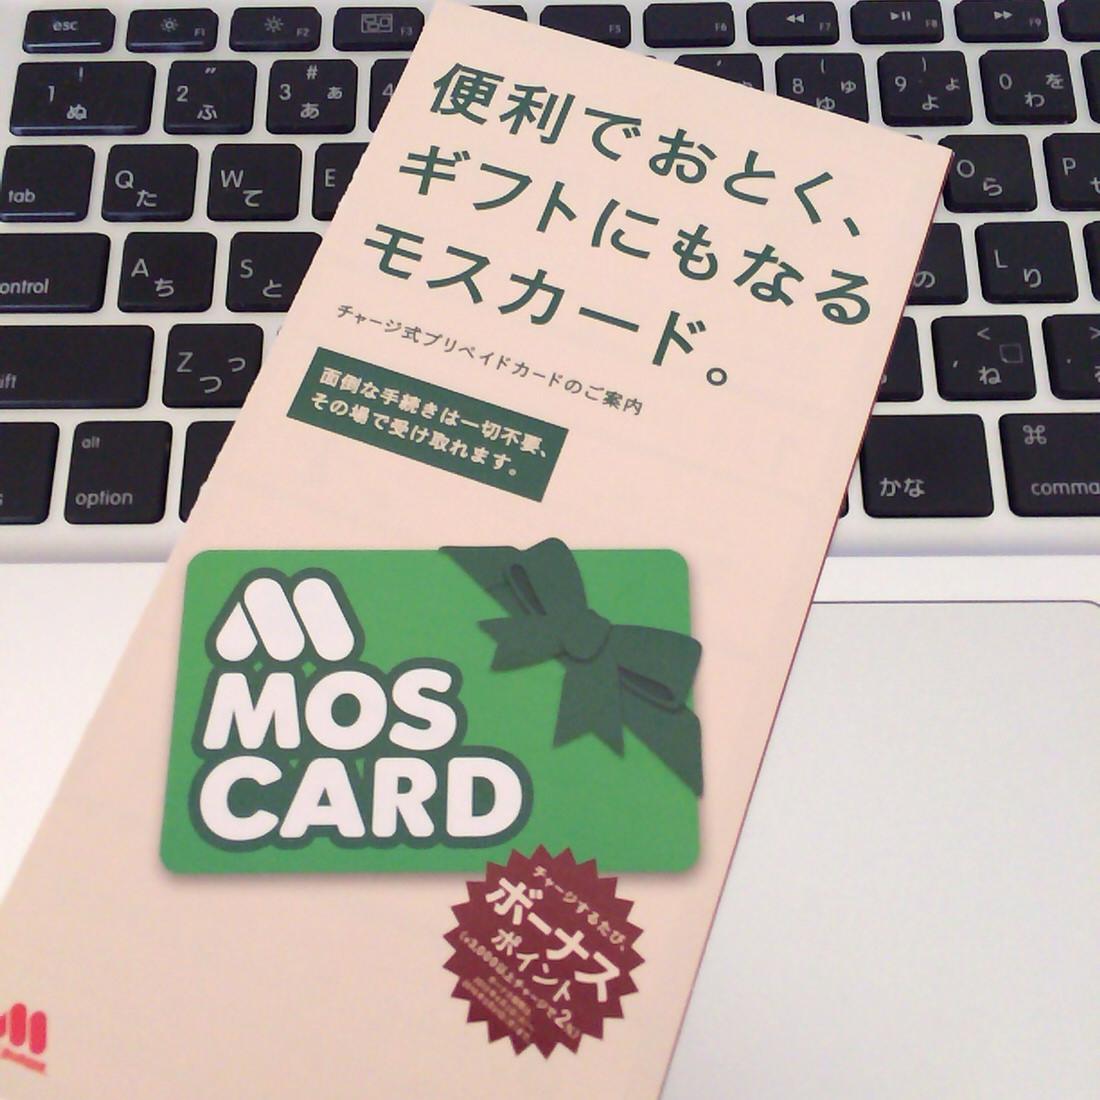 mow-card-04